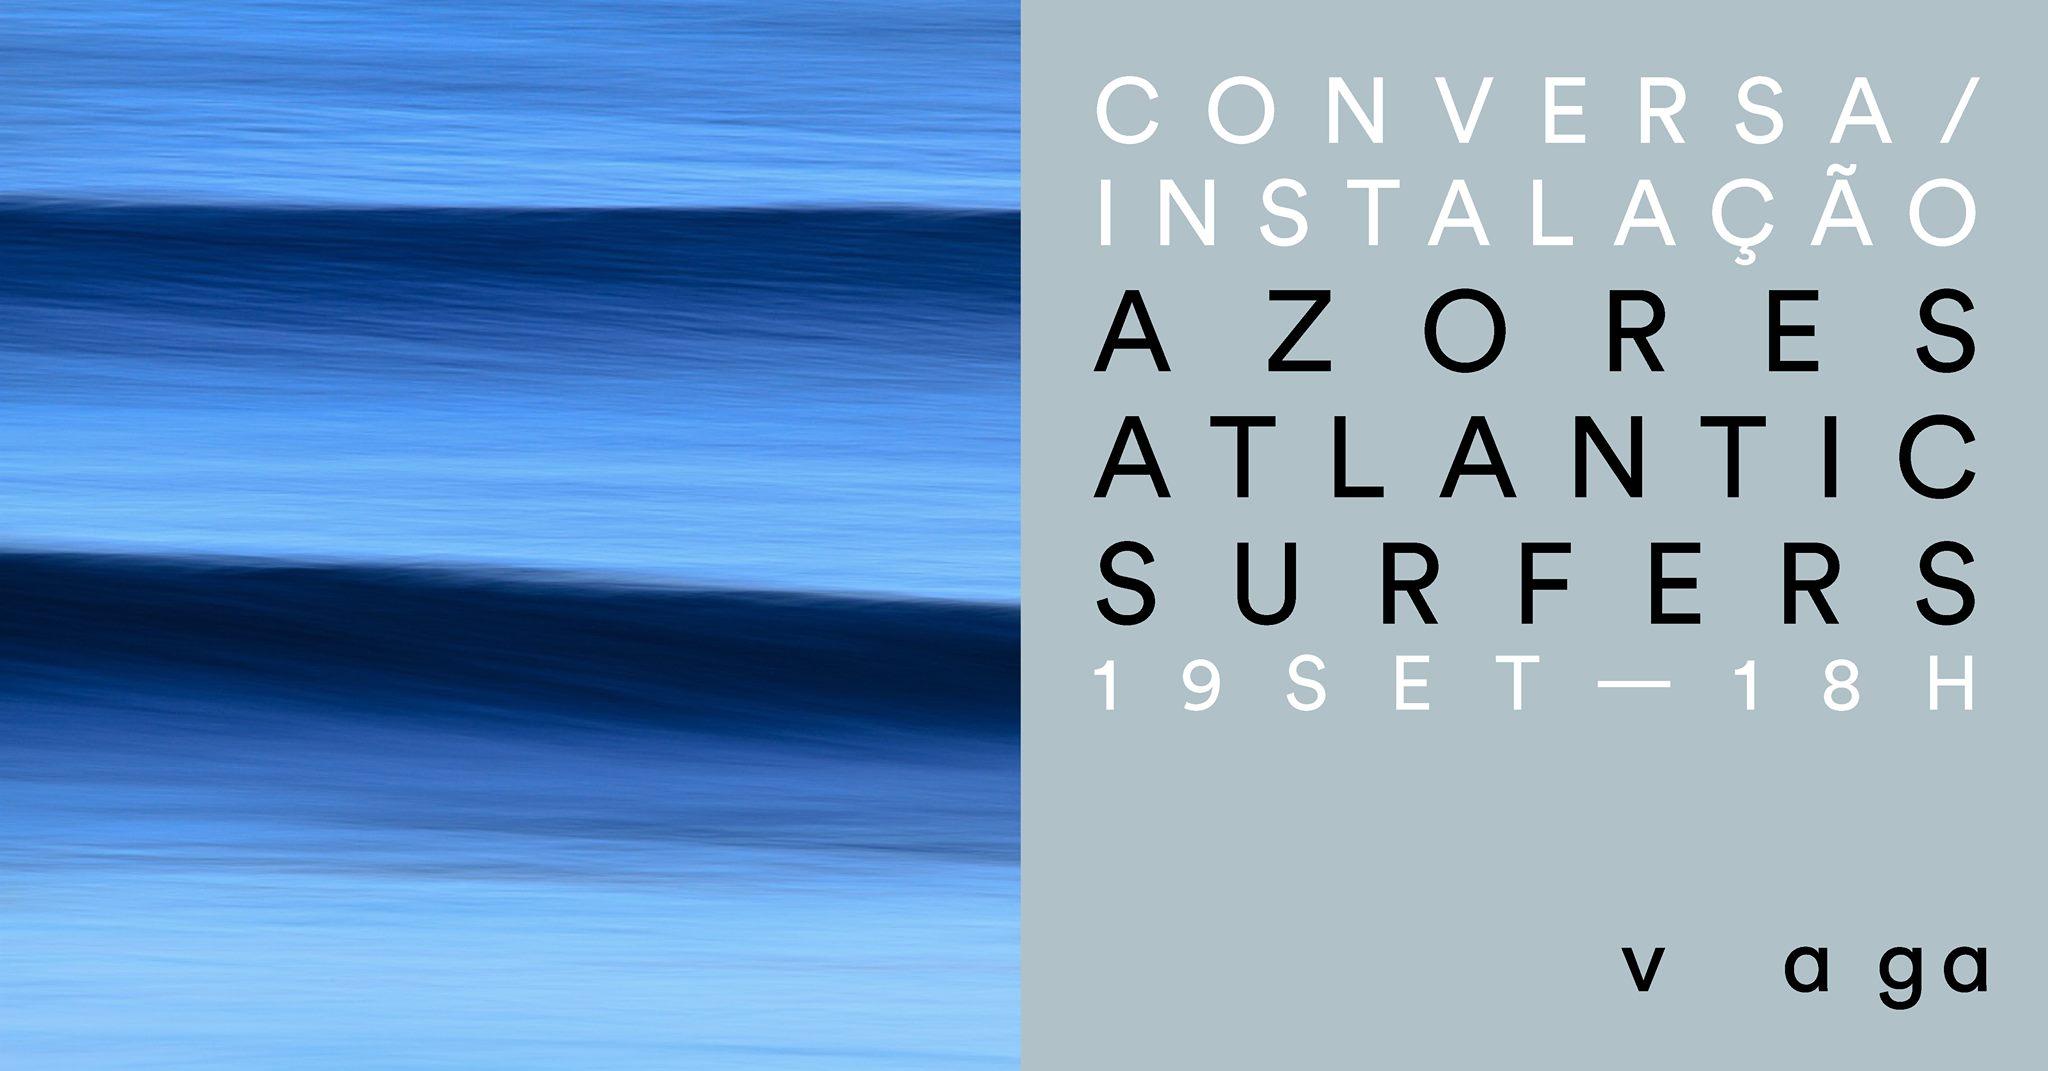 Conversa com Azores Atlantic Surfers